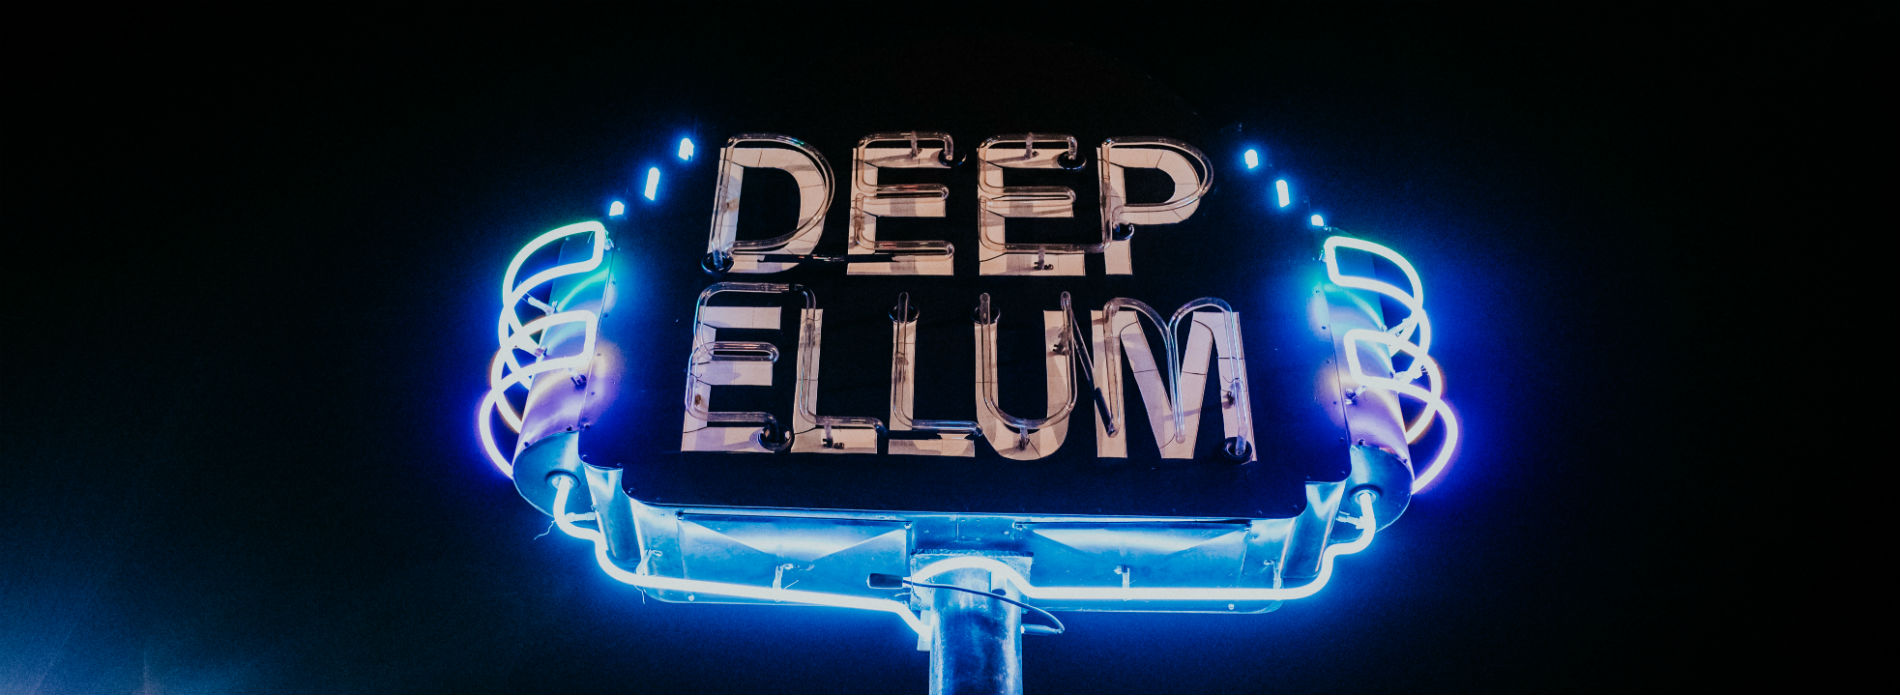 deep-ellum.jpg